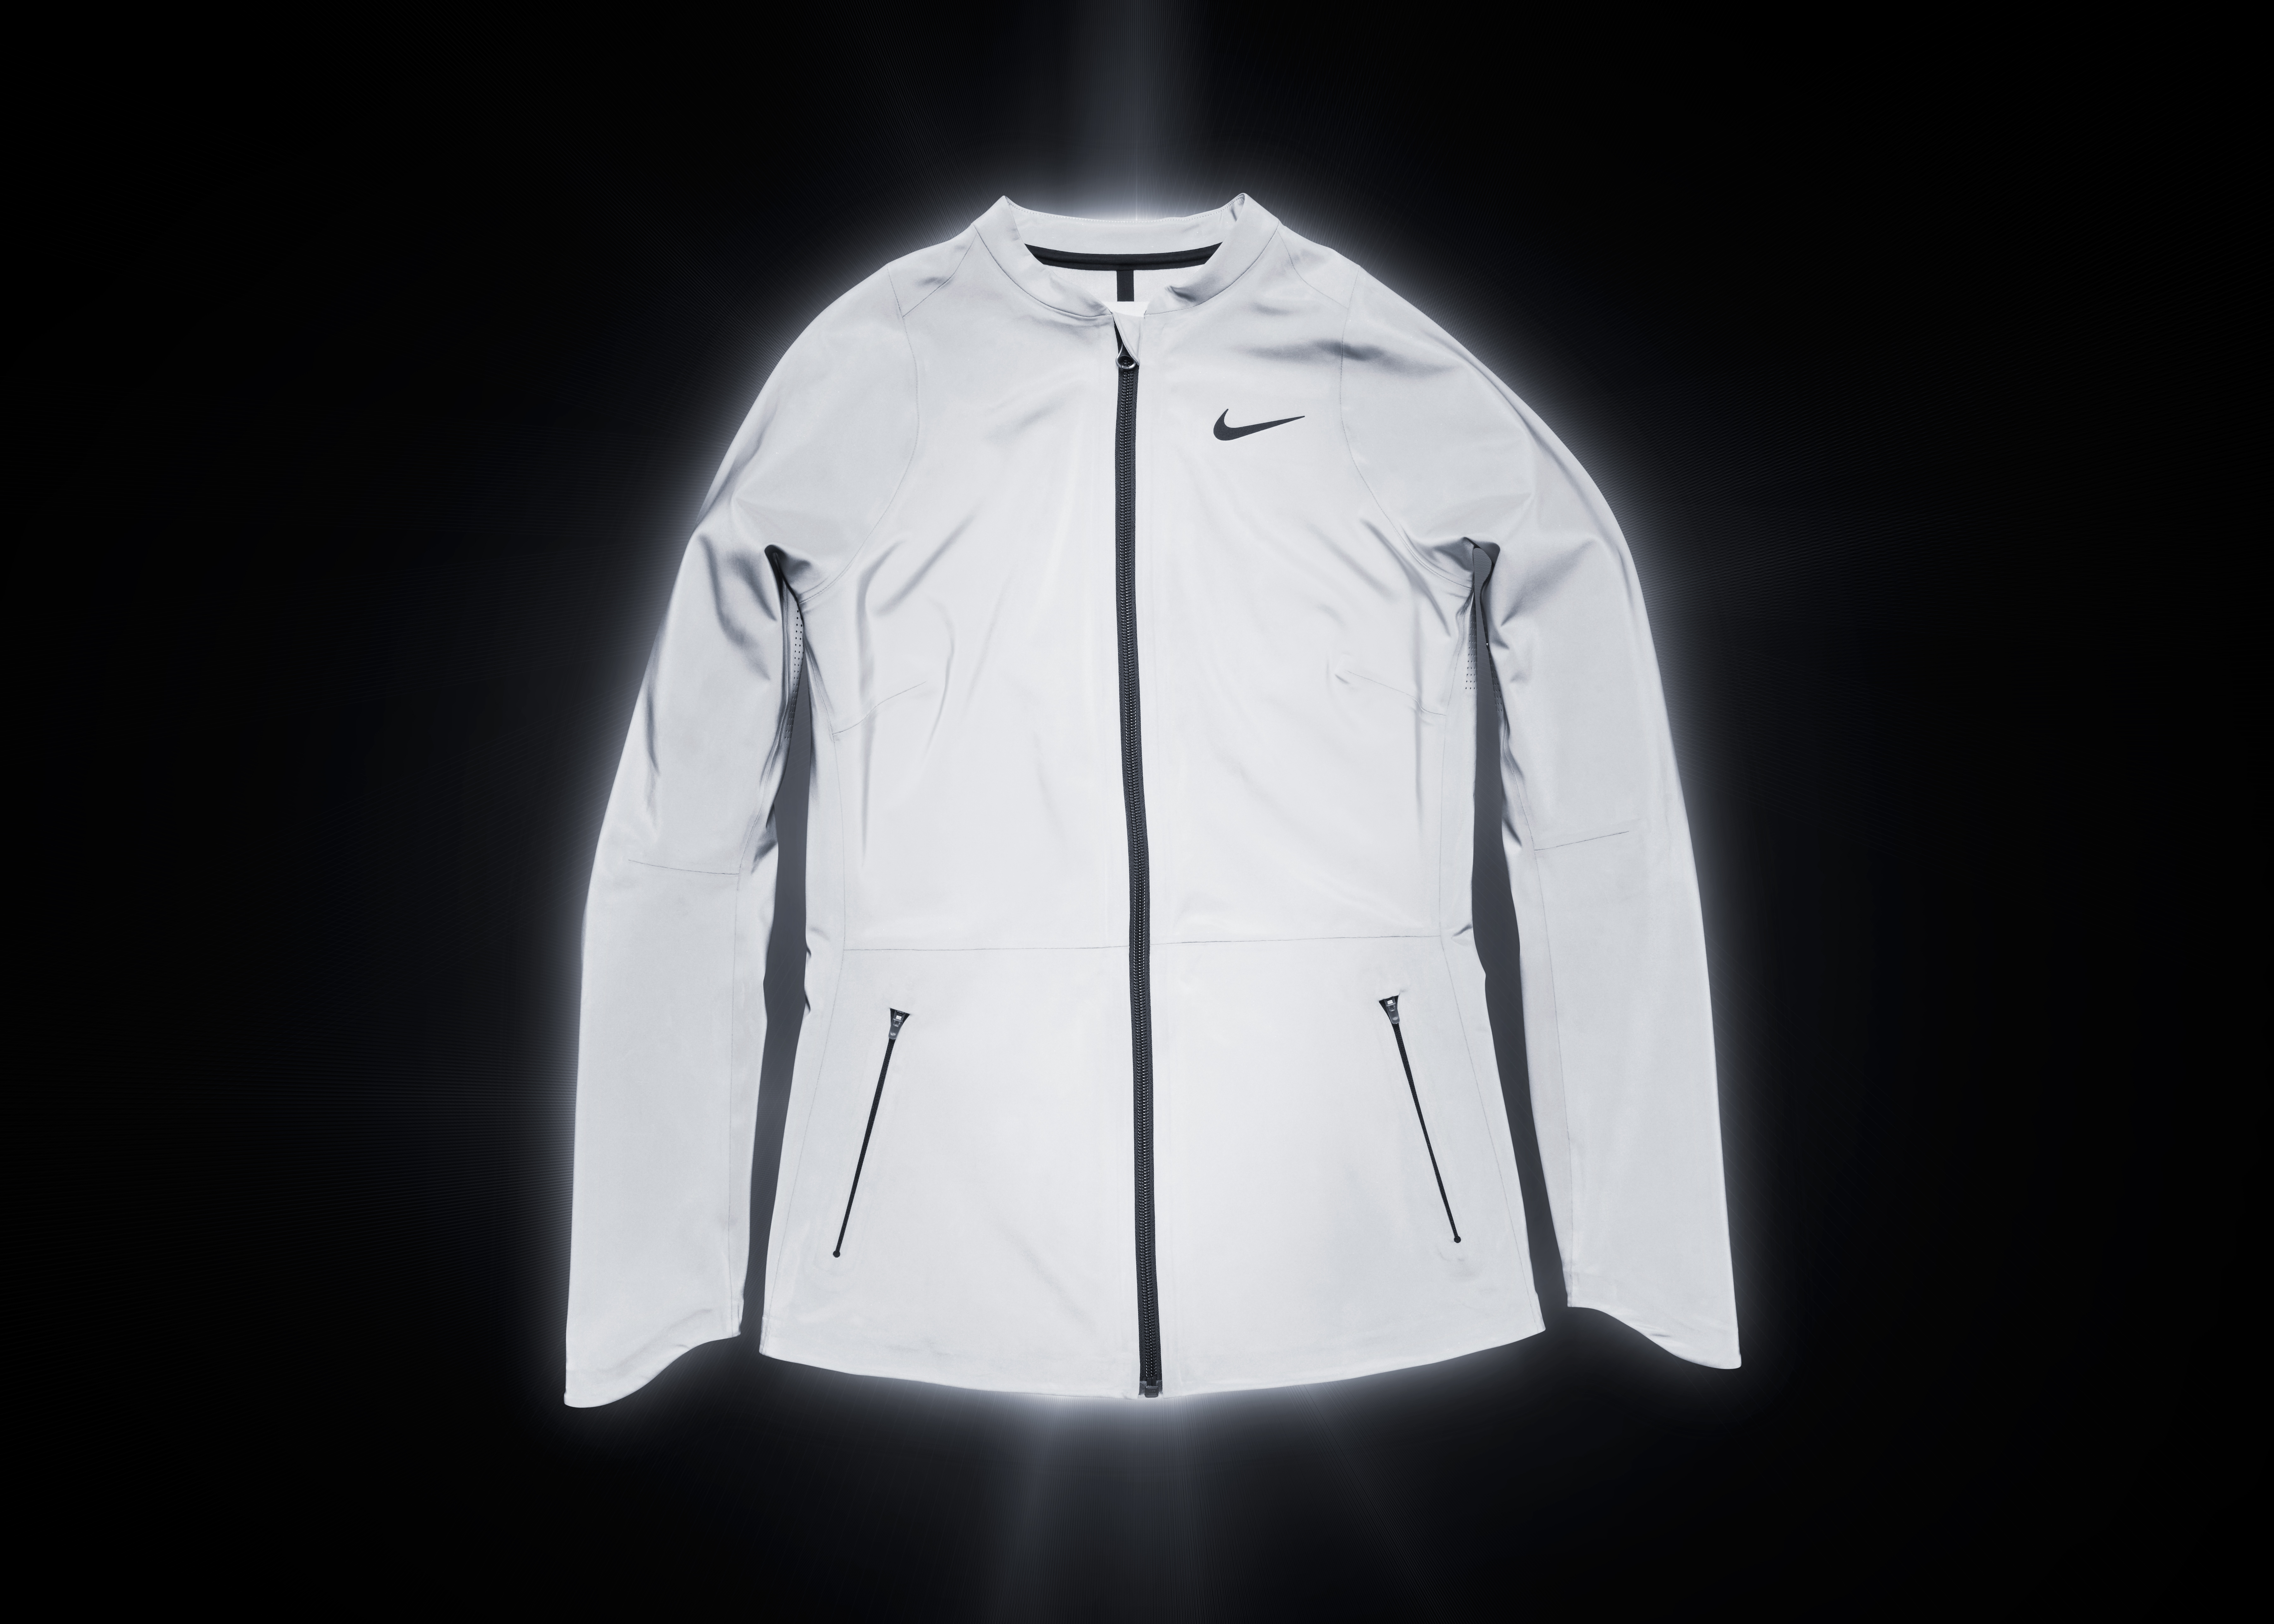 Nike Jacket Light Up unit4motors.co.uk 2dc7dffb6